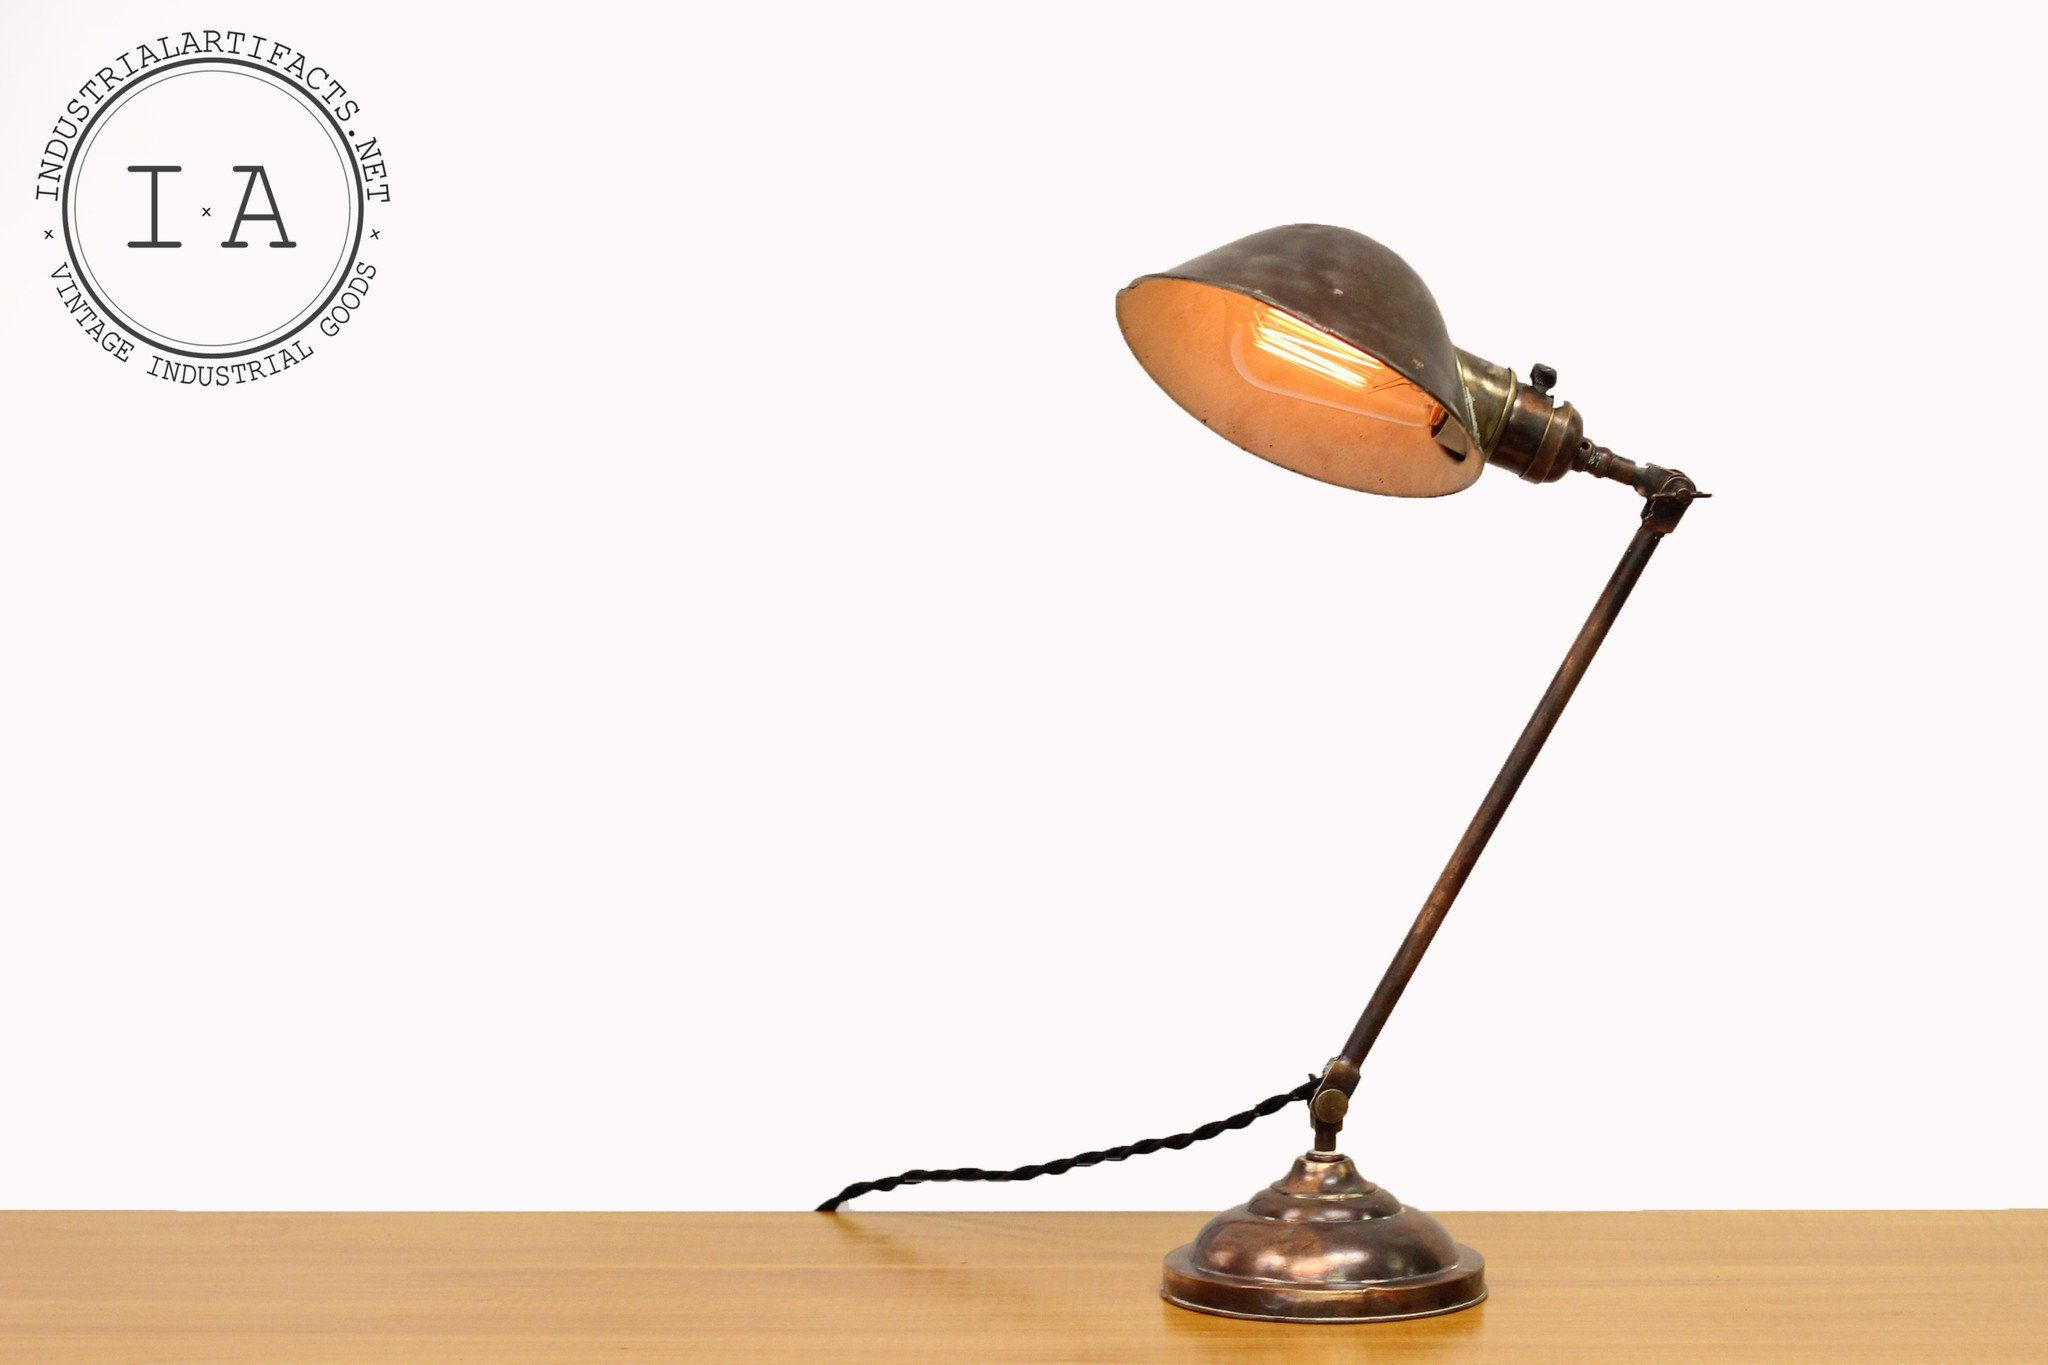 oil pin antique bankers jt lamps desk lamp bronze for less lighting